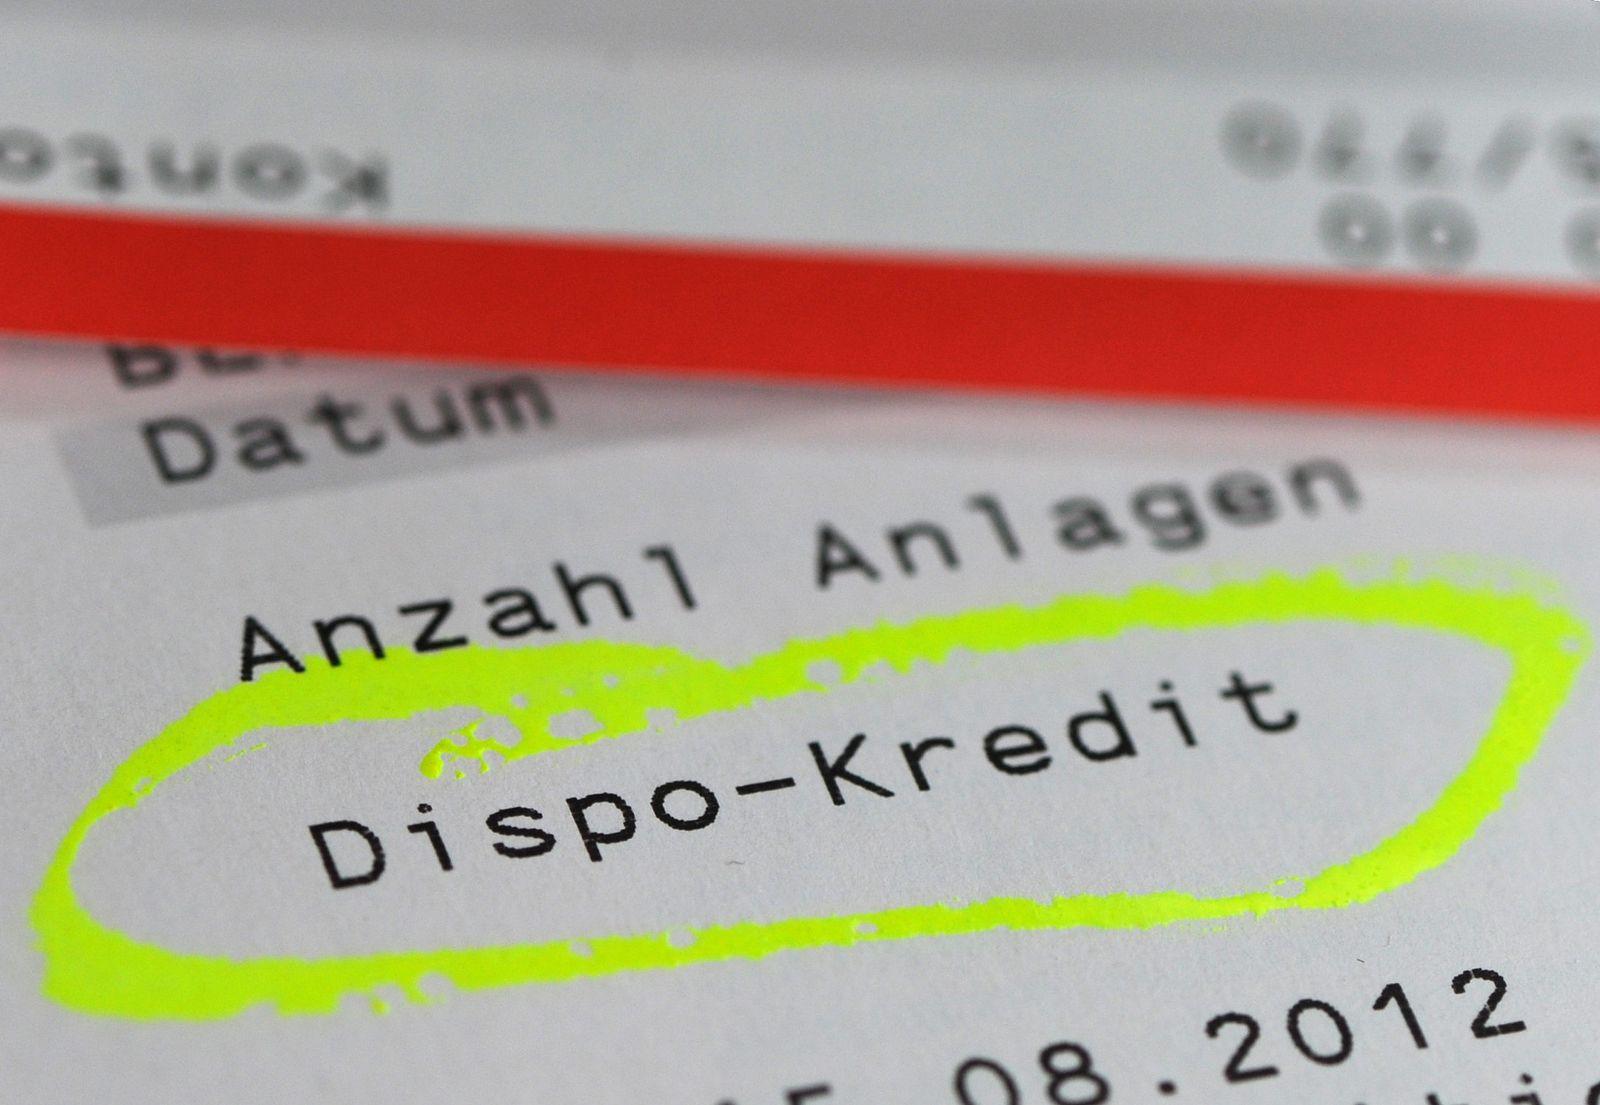 Dispozinsen / Kontoauszug Dispo-Kredit